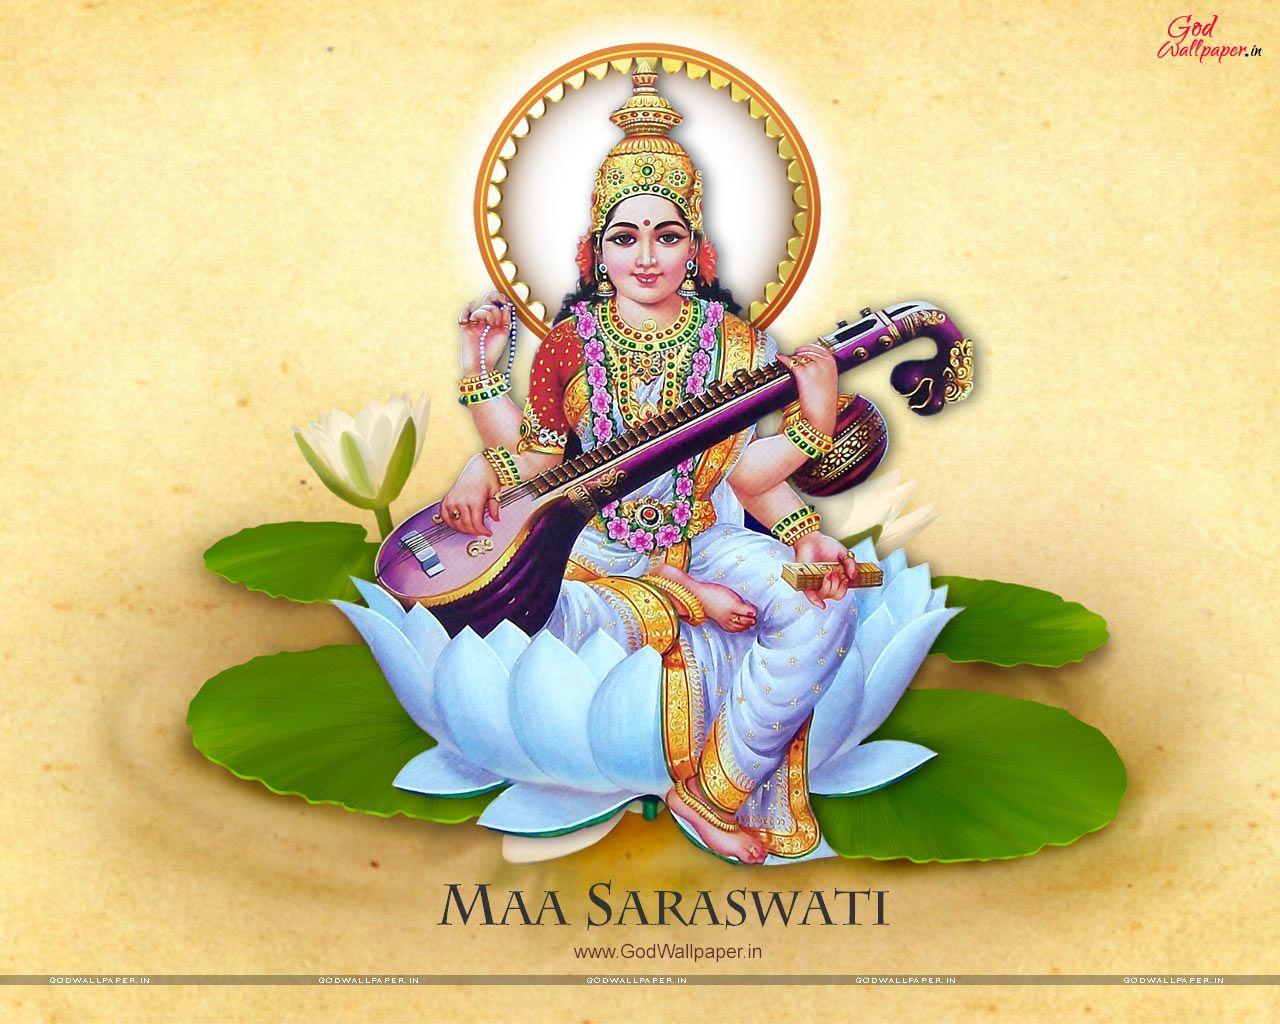 Maa Saraswati Full Size Hd Wallpaper Download Saraswati Mata Saraswati Goddess Maa Wallpaper